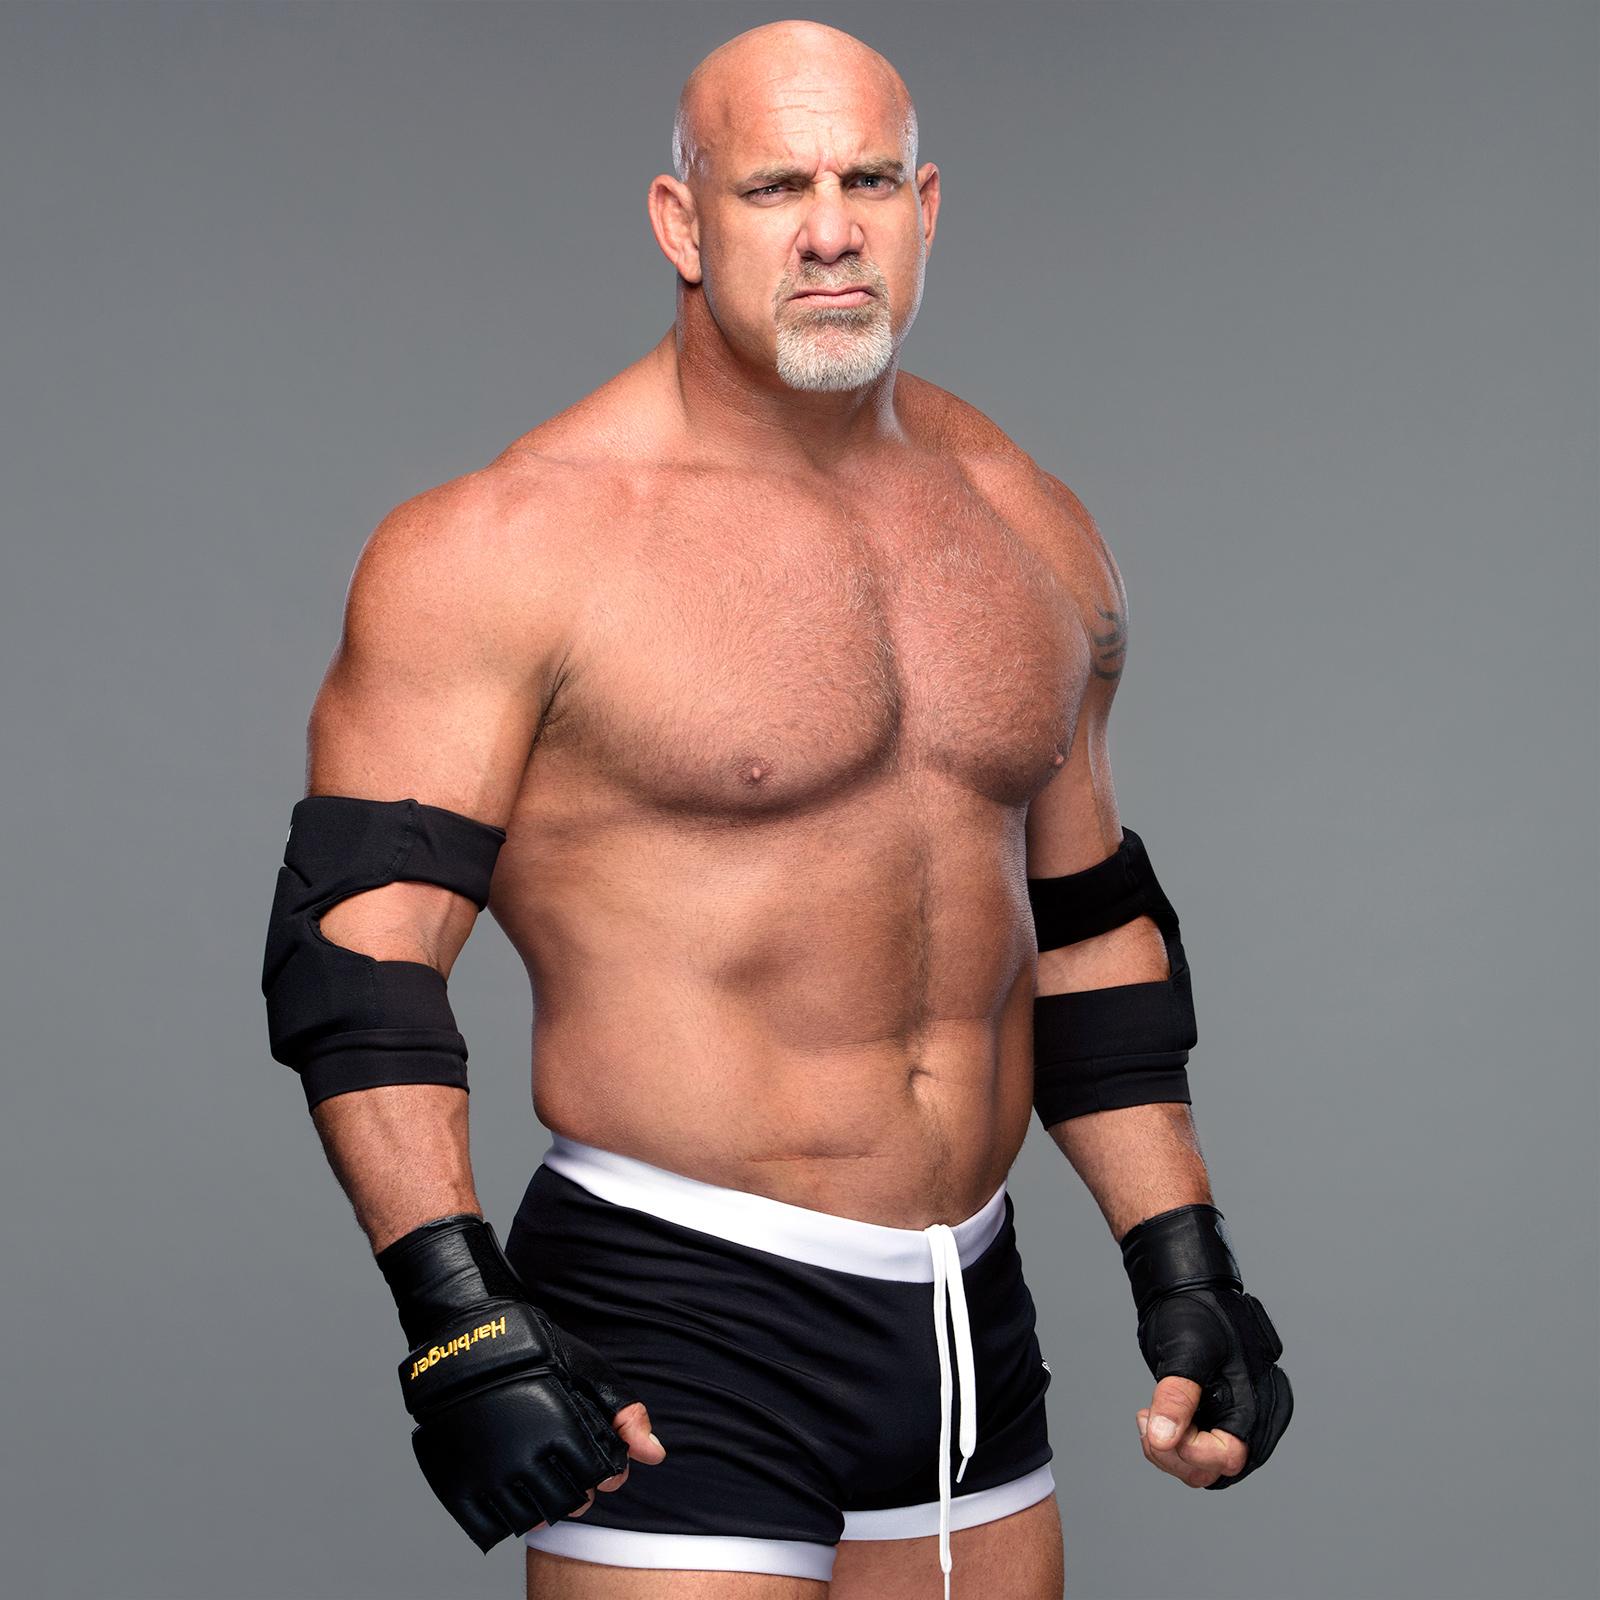 Wwe wrestlers hookup in real life